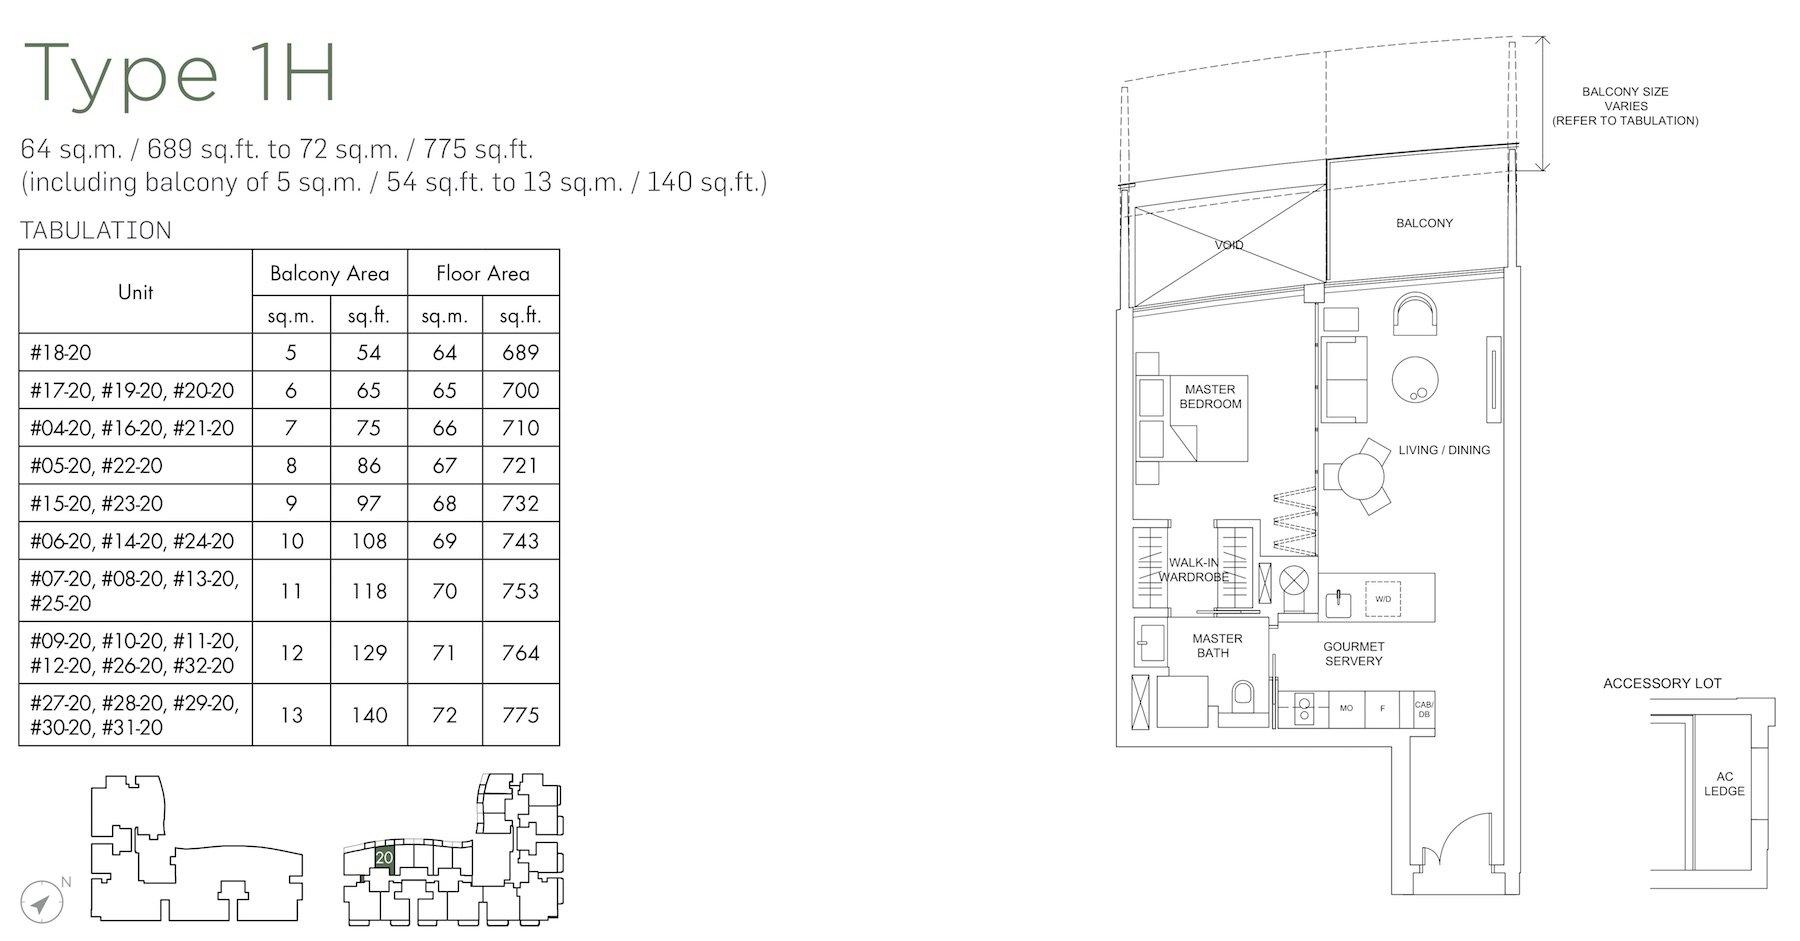 Marina One Residences 滨海盛景豪苑 floor plans 1 bedroom 1H